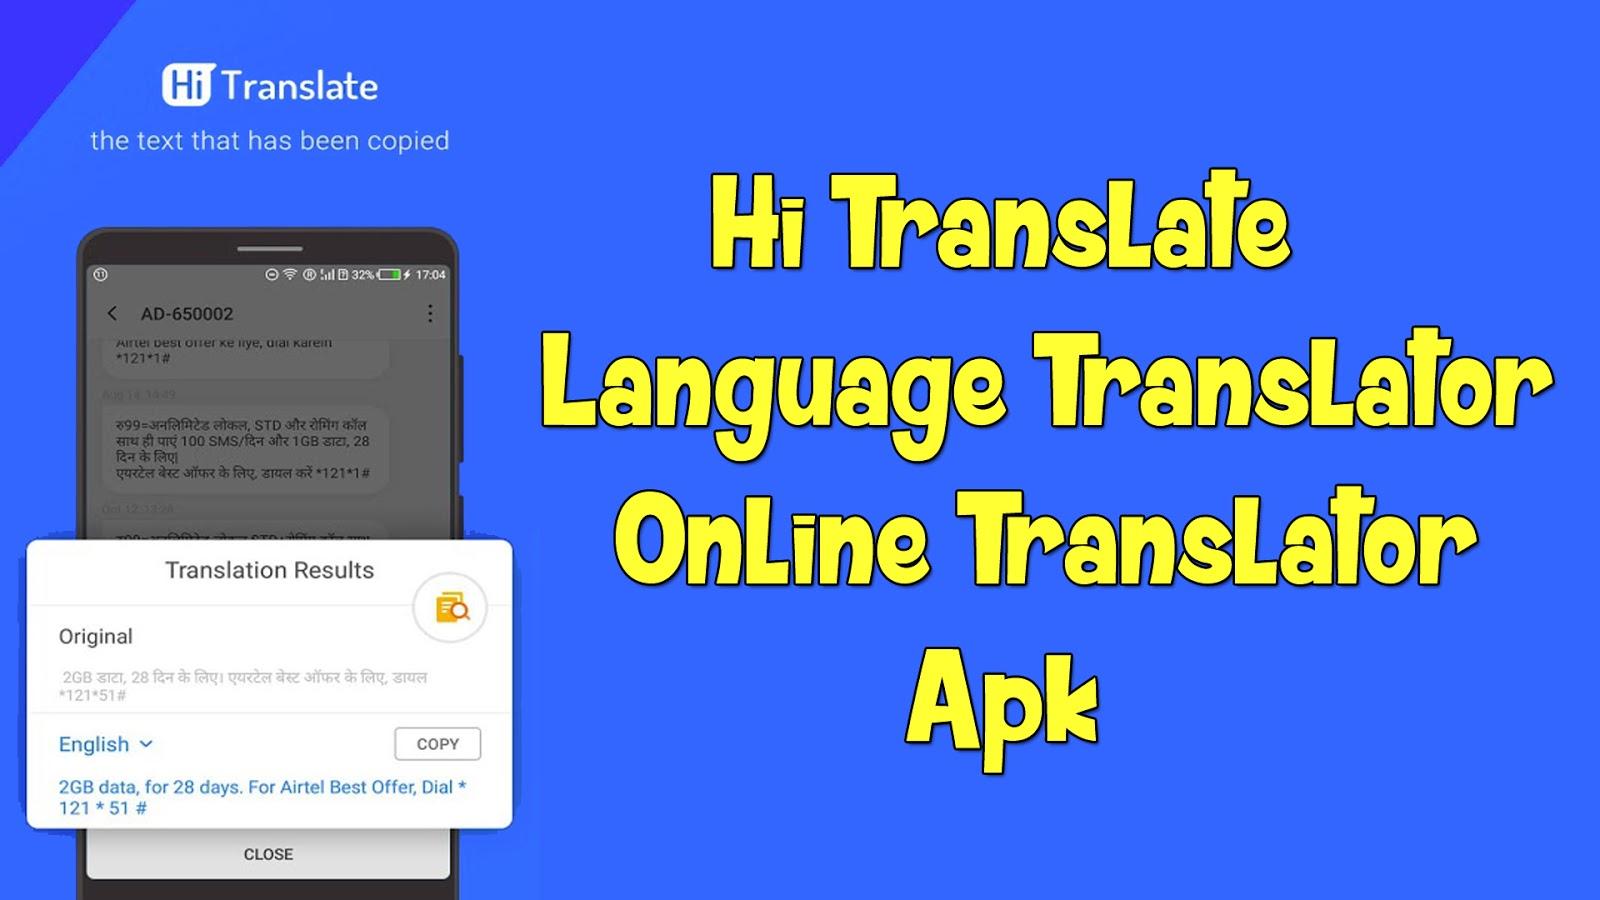 HI Translate: Online Language Translator